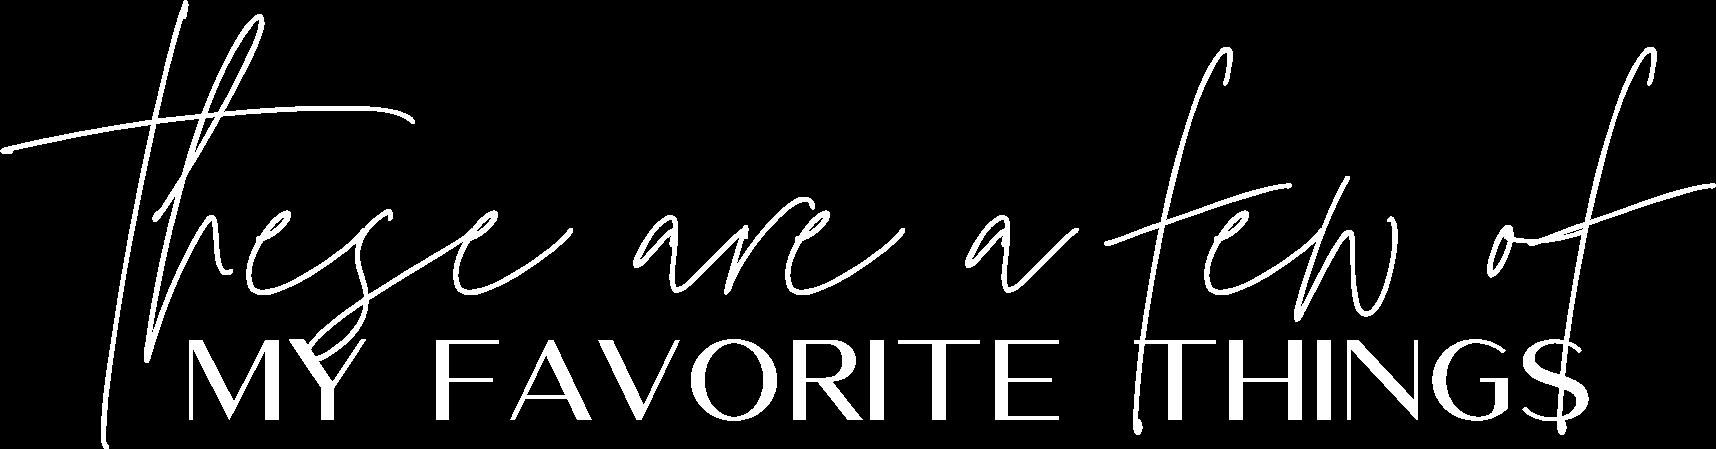 lauren layne - script - favorite things.png